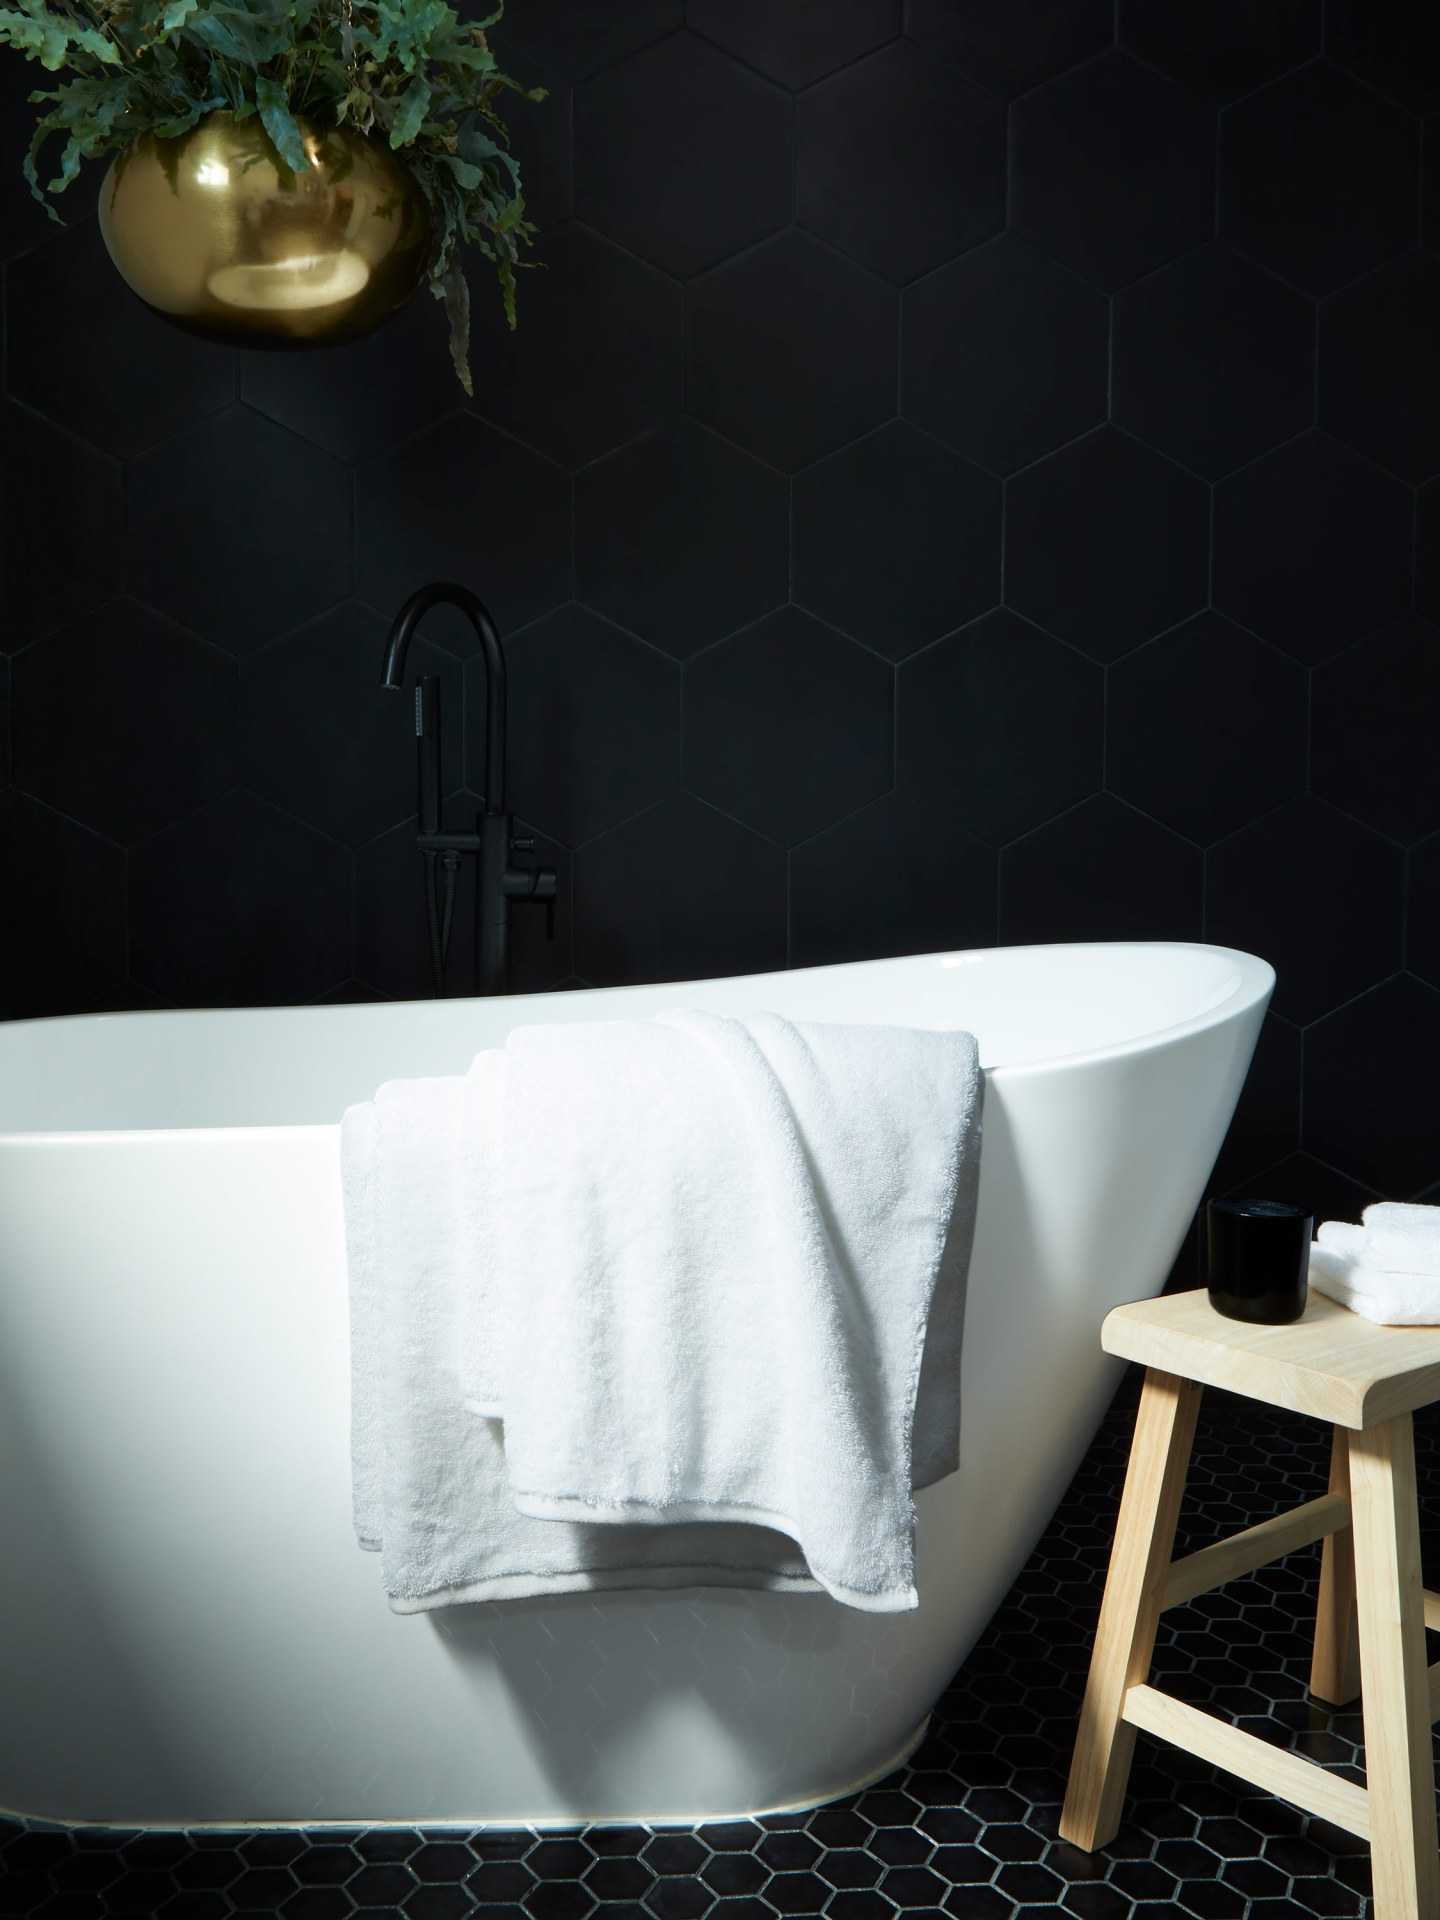 Italic's Innovative Business Model - luxury home linens